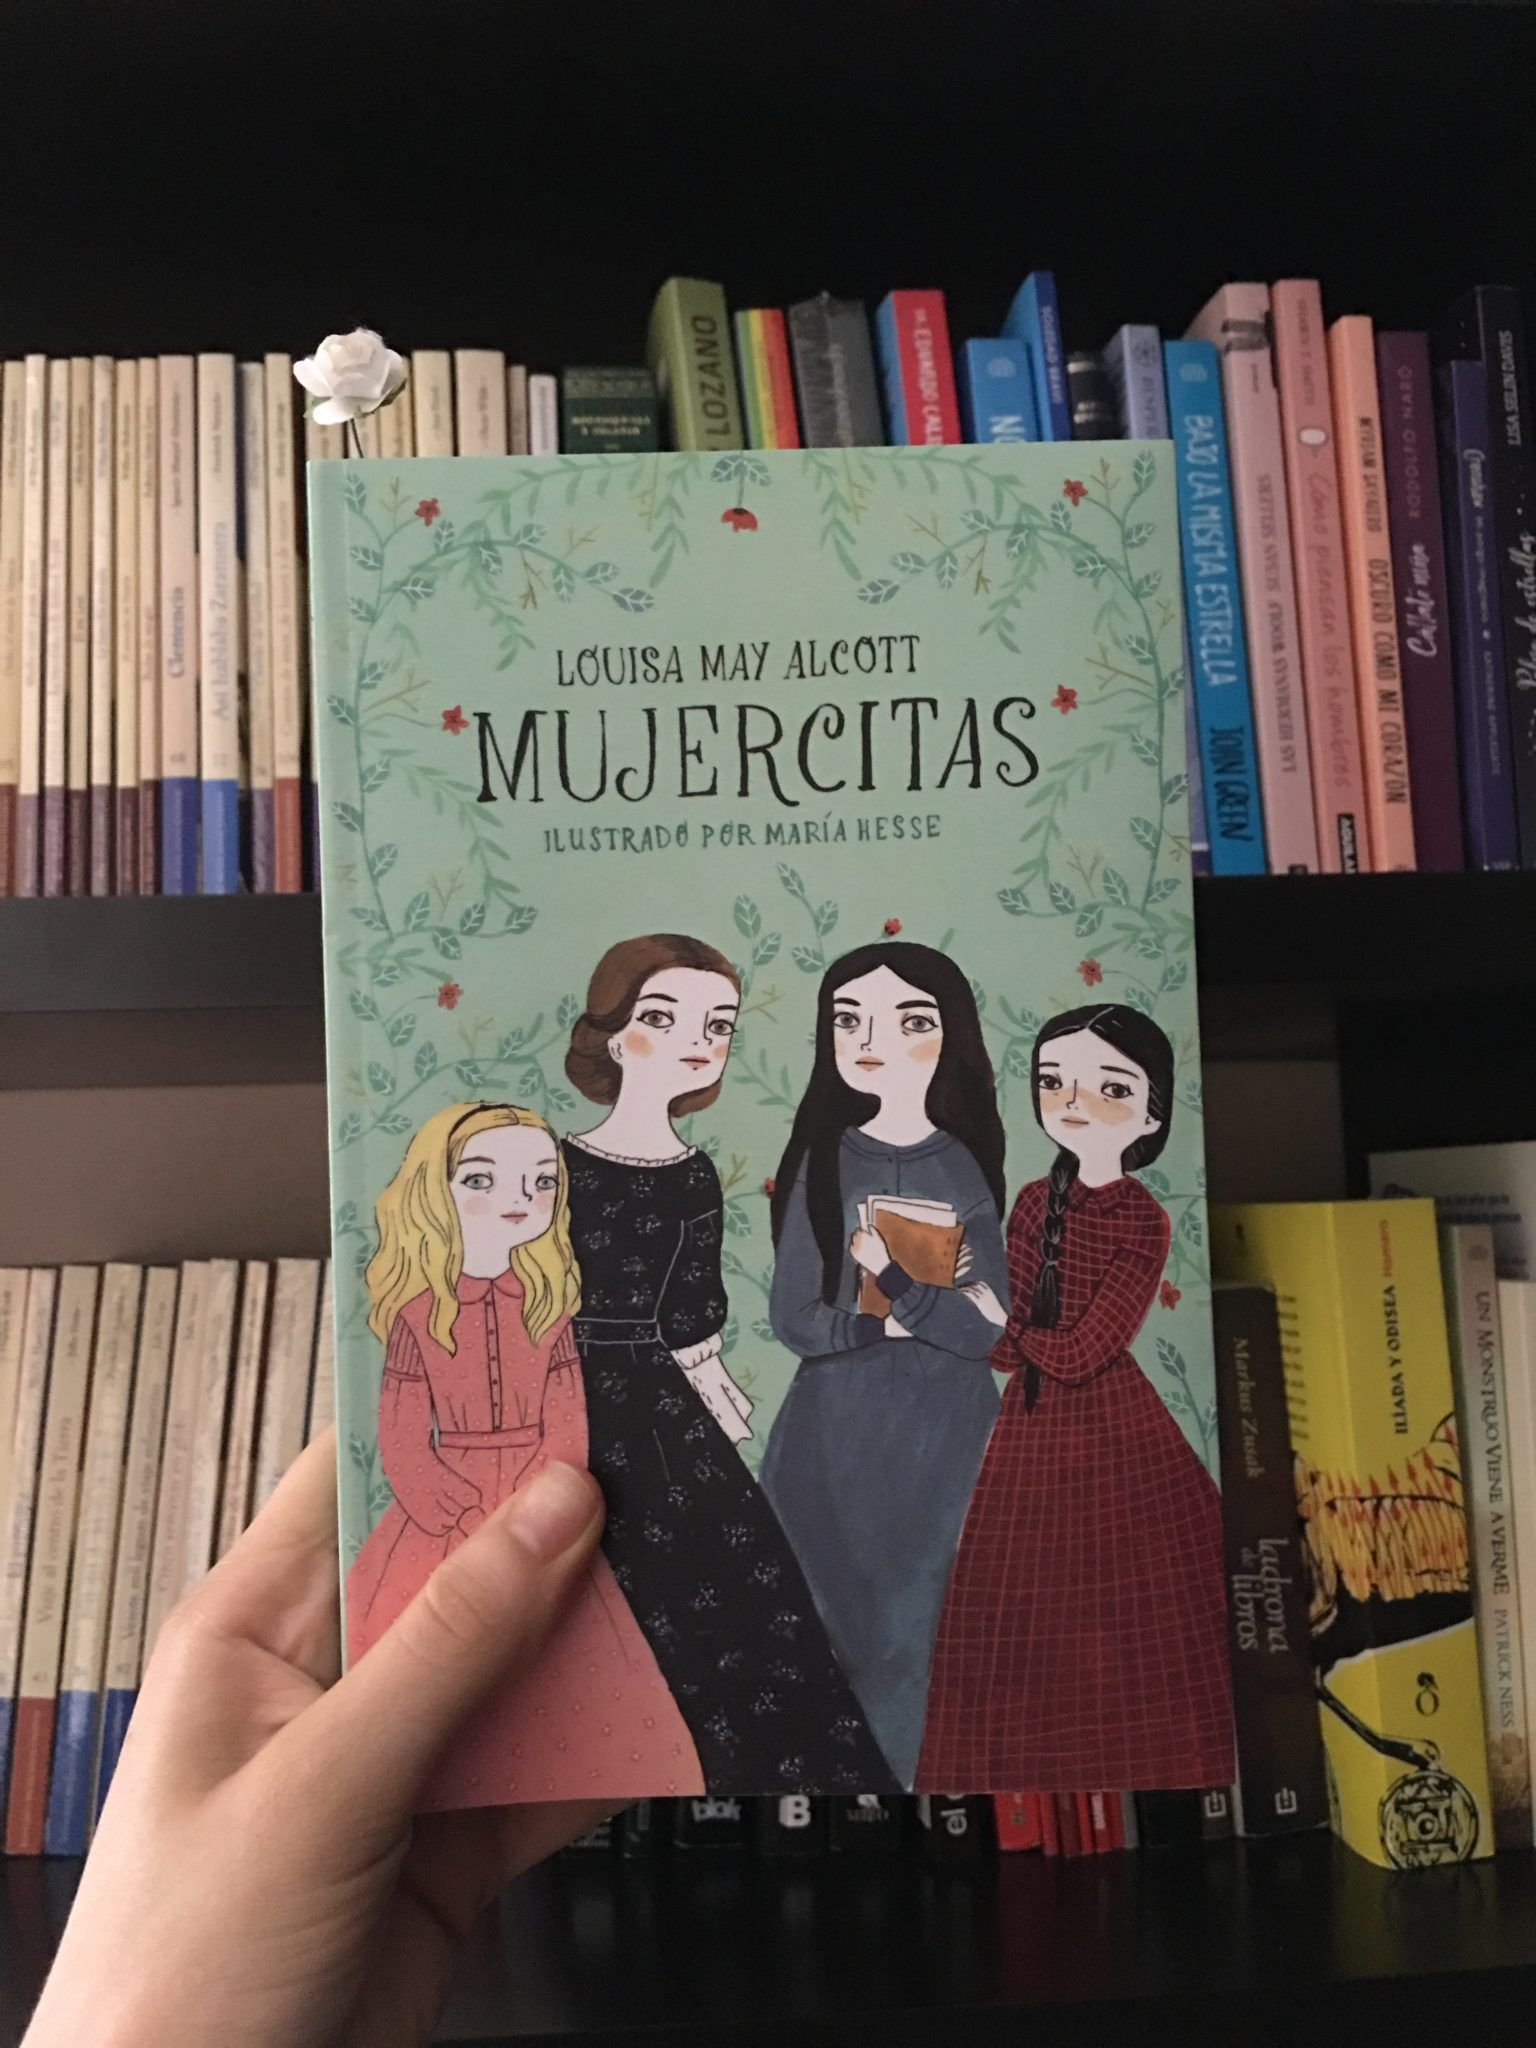 Mujercitas De Louisa May Alcott Reseña En 2020 Louisa May Alcott Mujercitas Blog De Libros